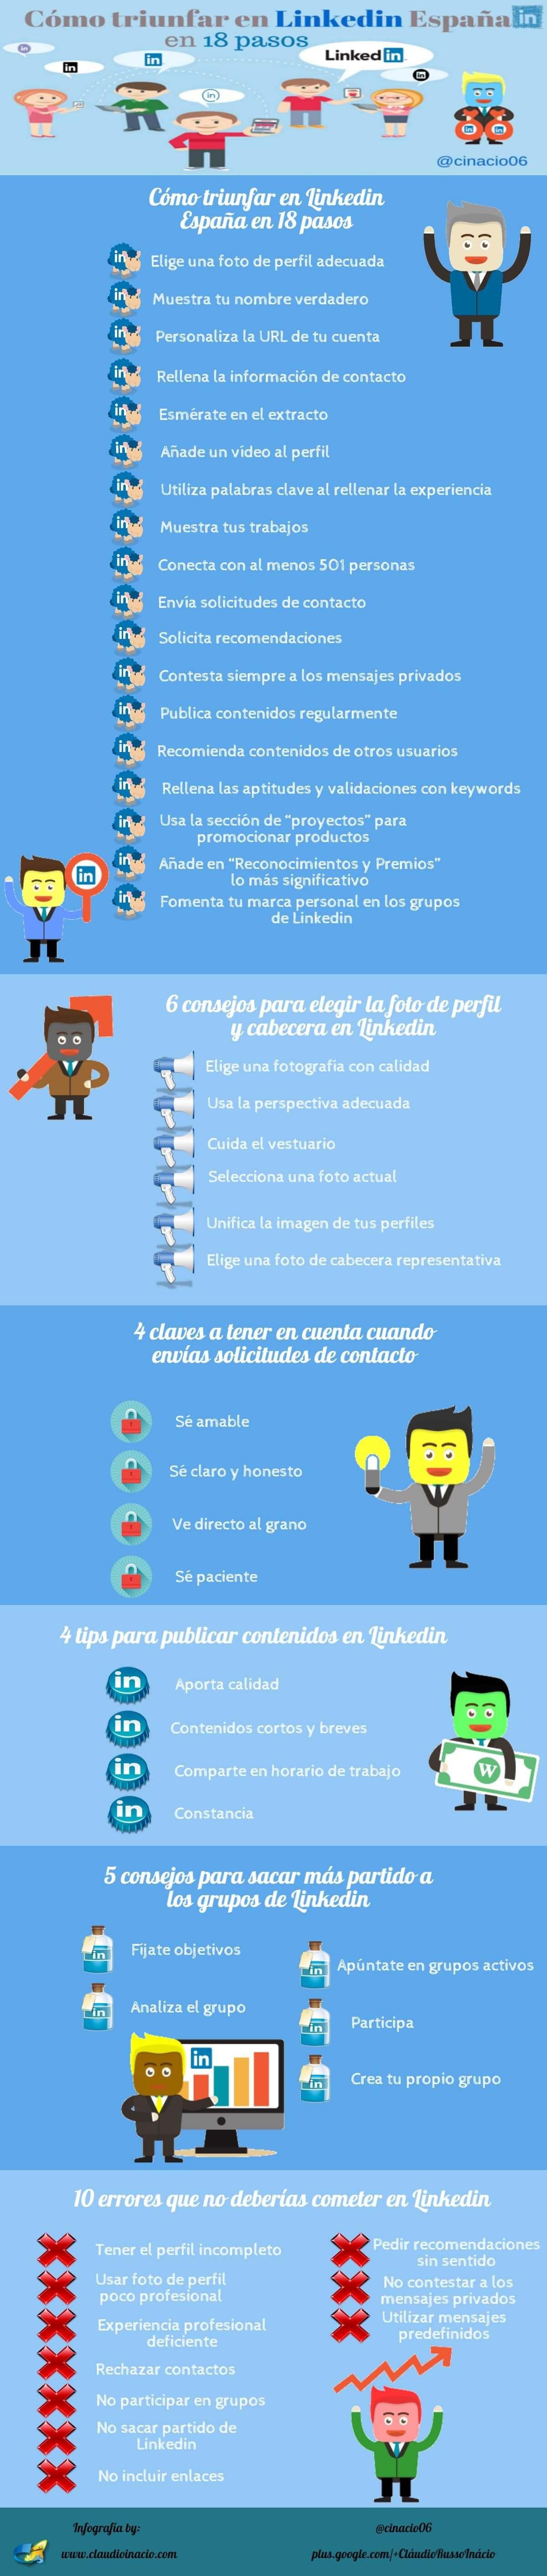 Guía de cómo triunfar en Linkedin España en 18 pasos